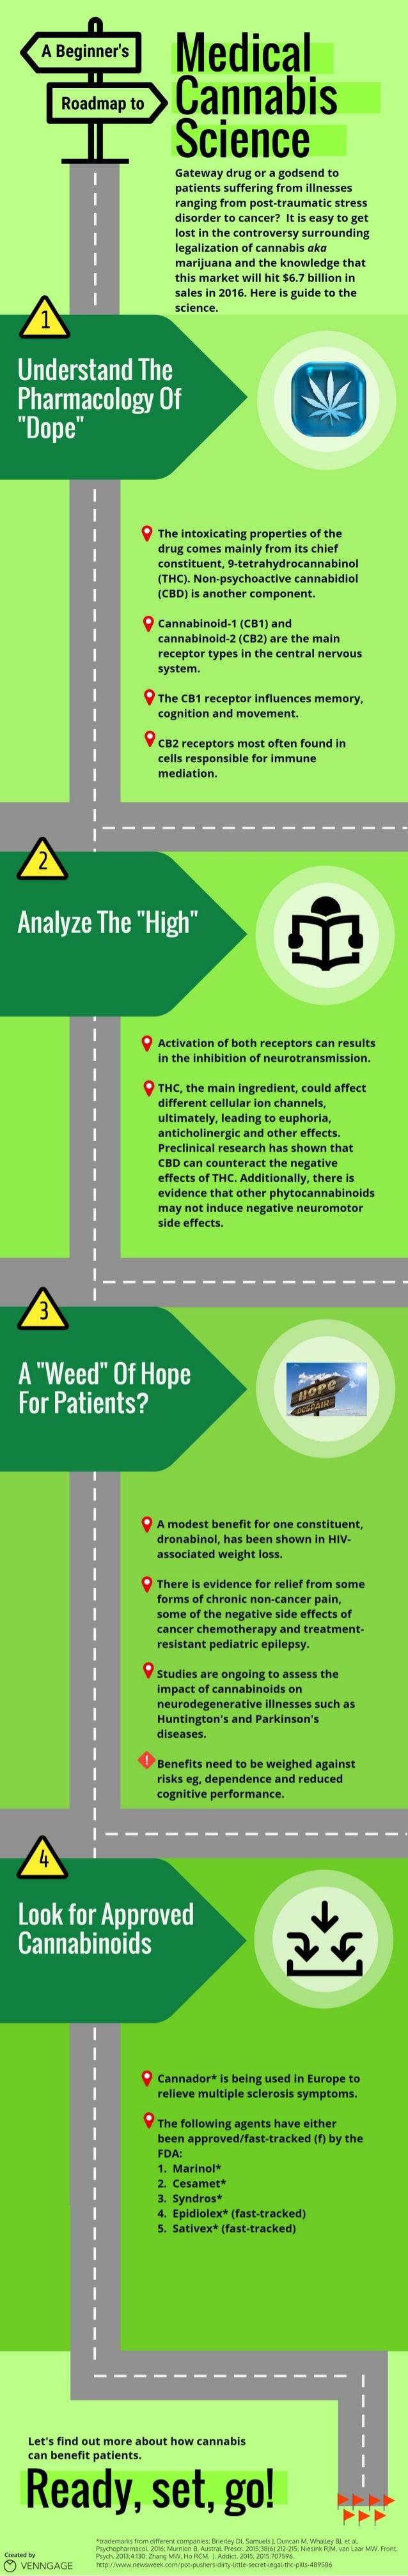 Medical cannabis science